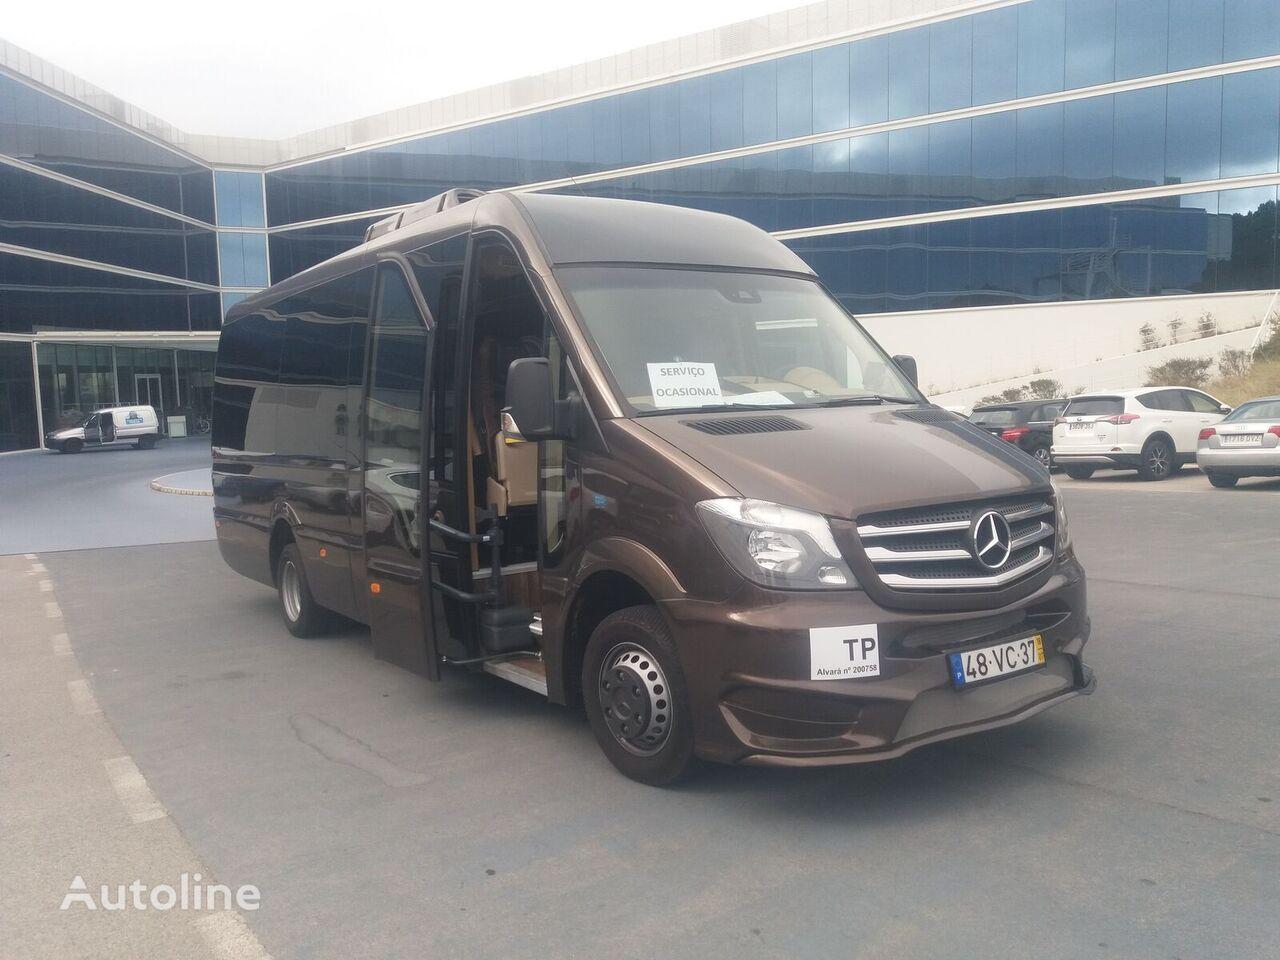 MERCEDES-BENZ Sprinter 516CDI Minibus passenger van